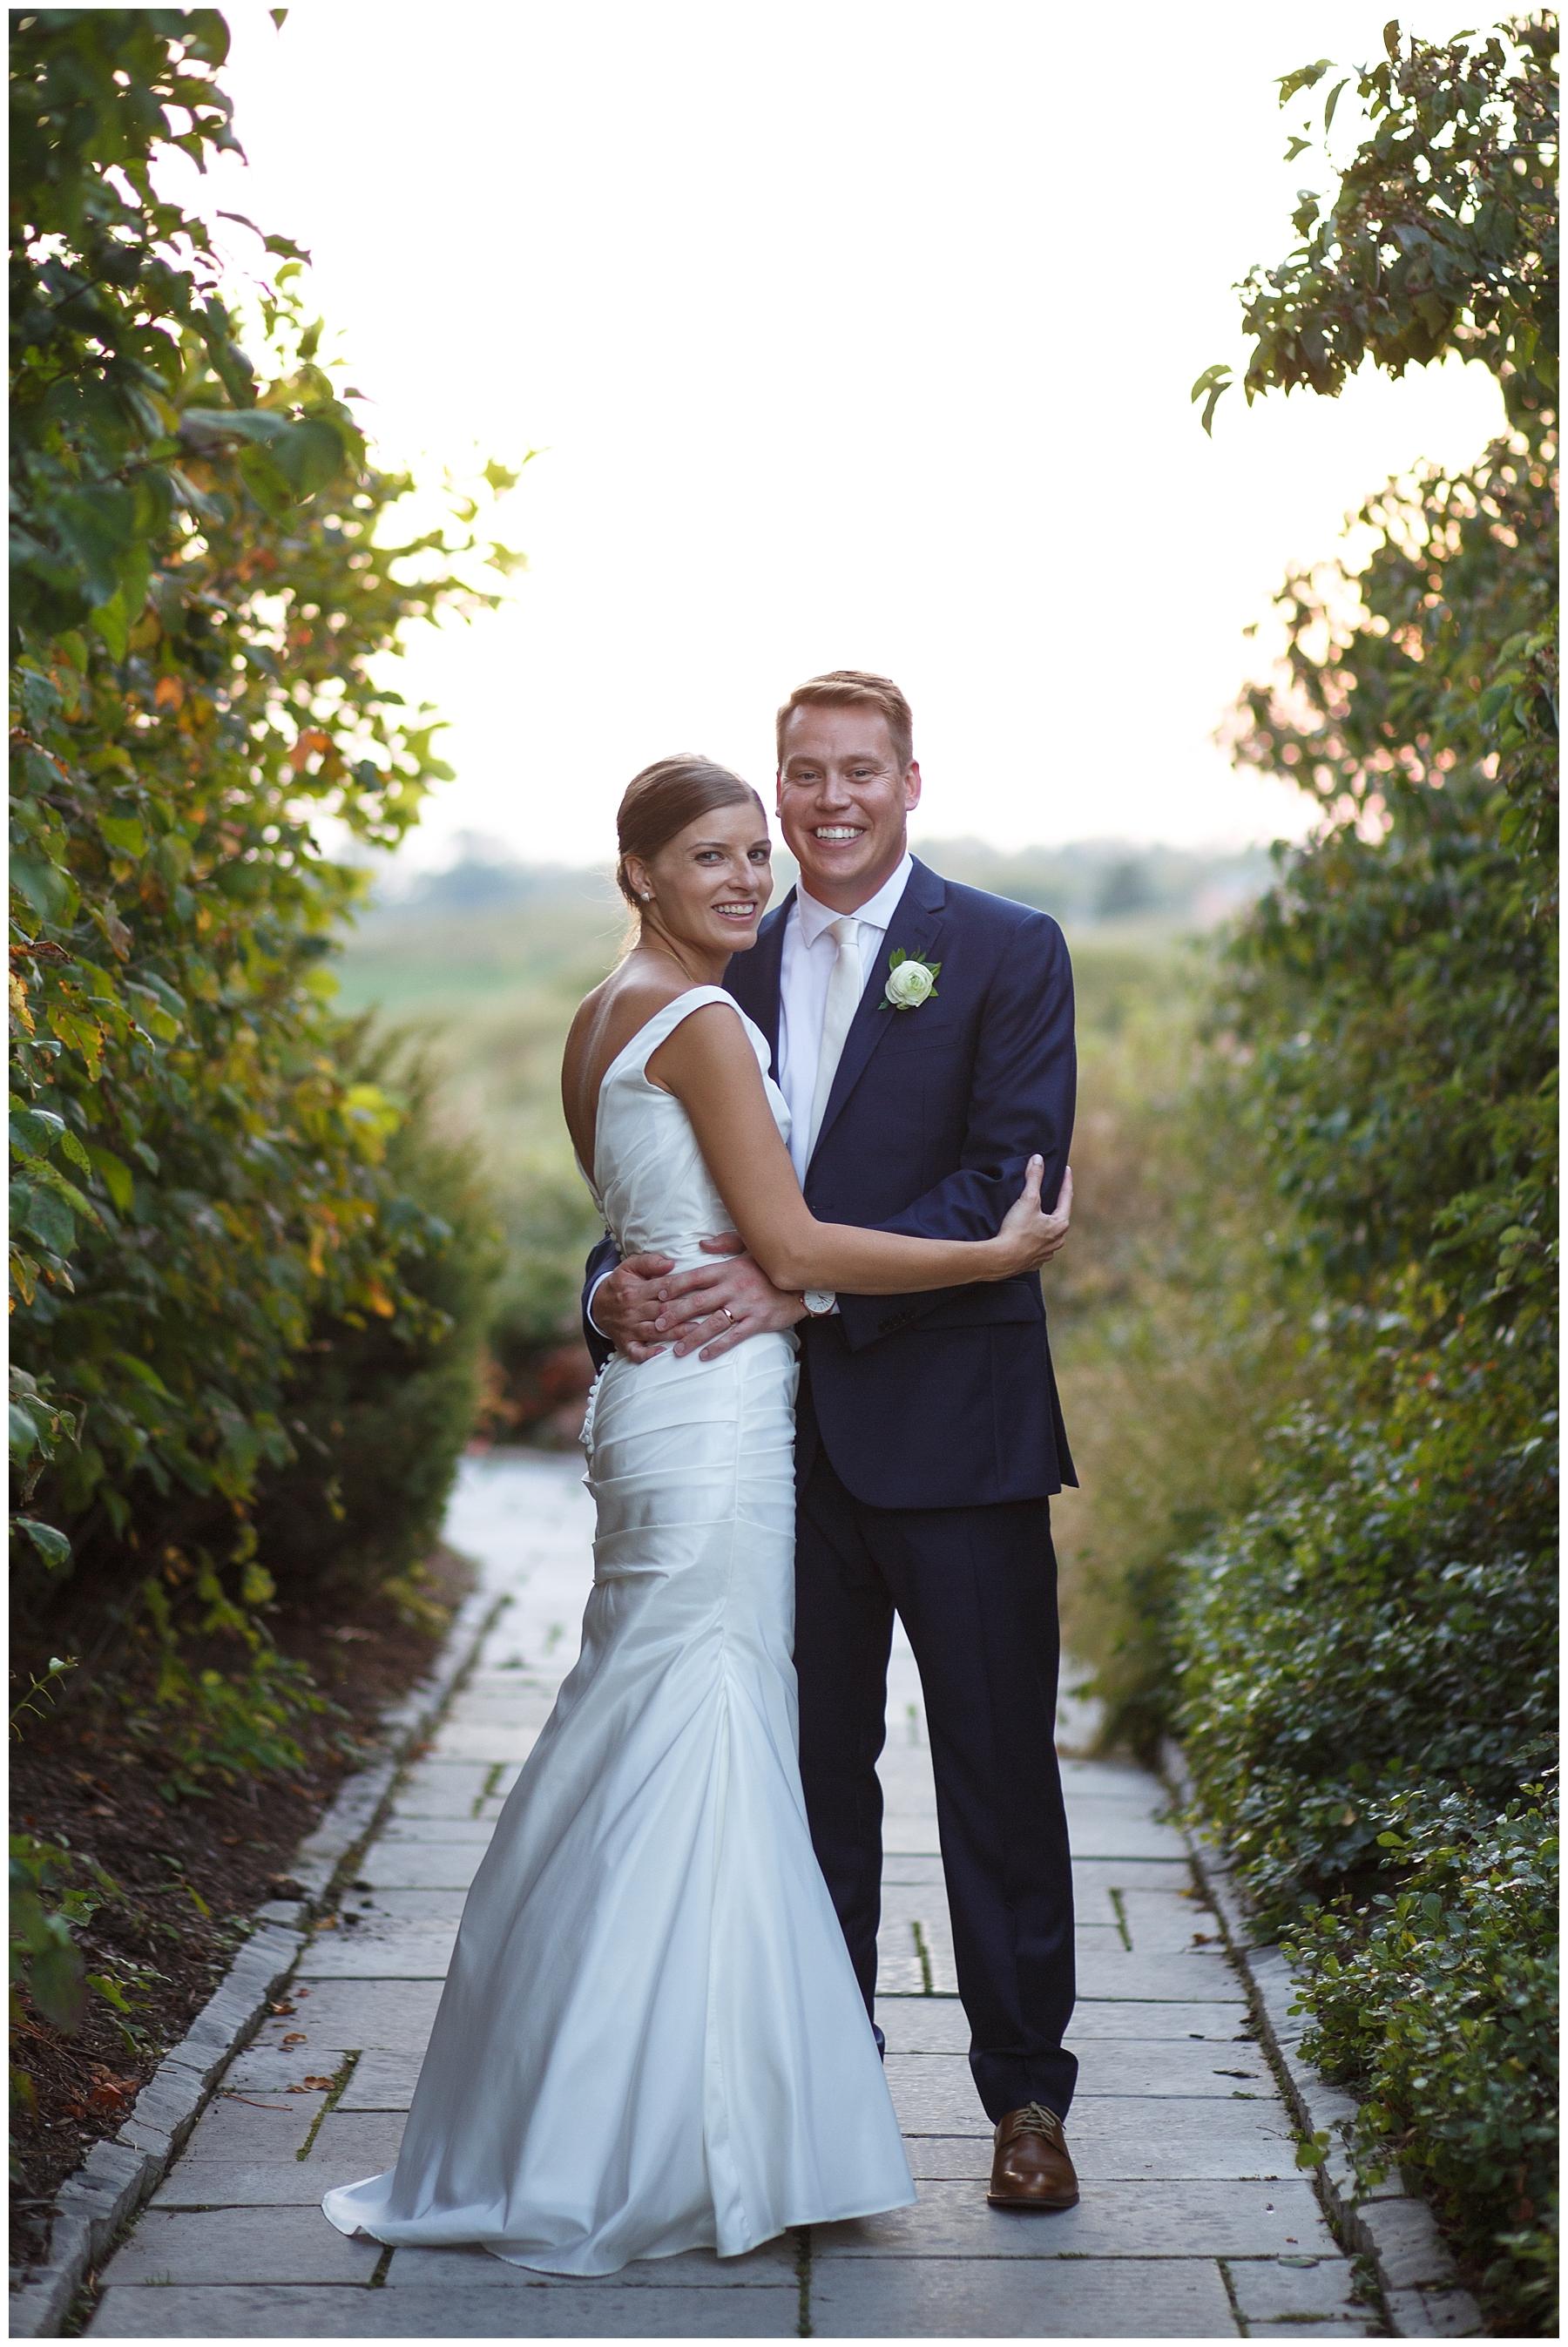 Elizabeth + Tad Married at Whistling Straits, Kohler WI 2017 - Chelsea Matson Photography